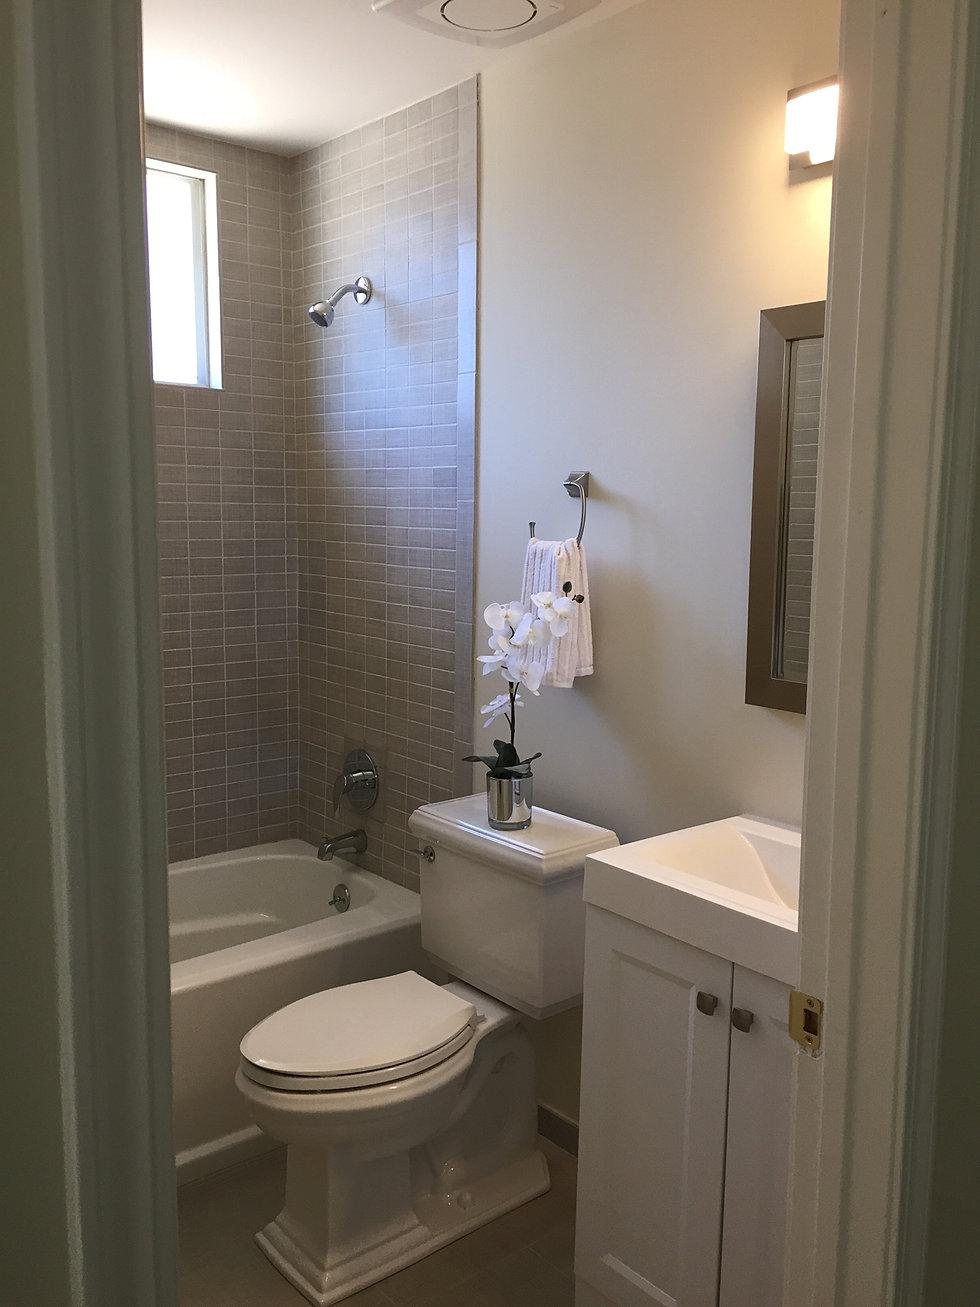 Turning a closet into a bathroom